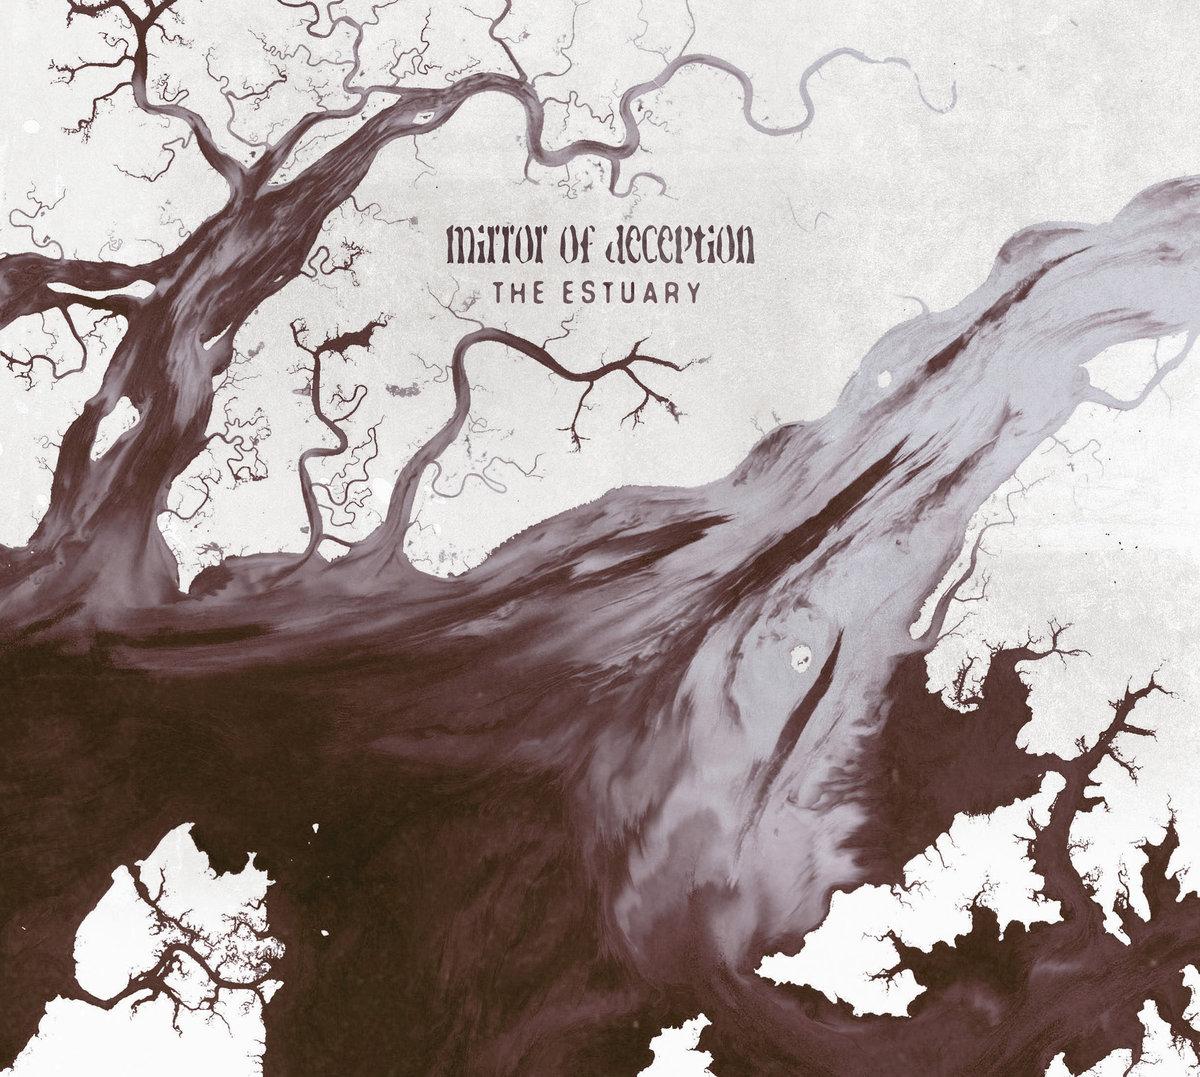 37. Mirror Of Deception - The Estuary